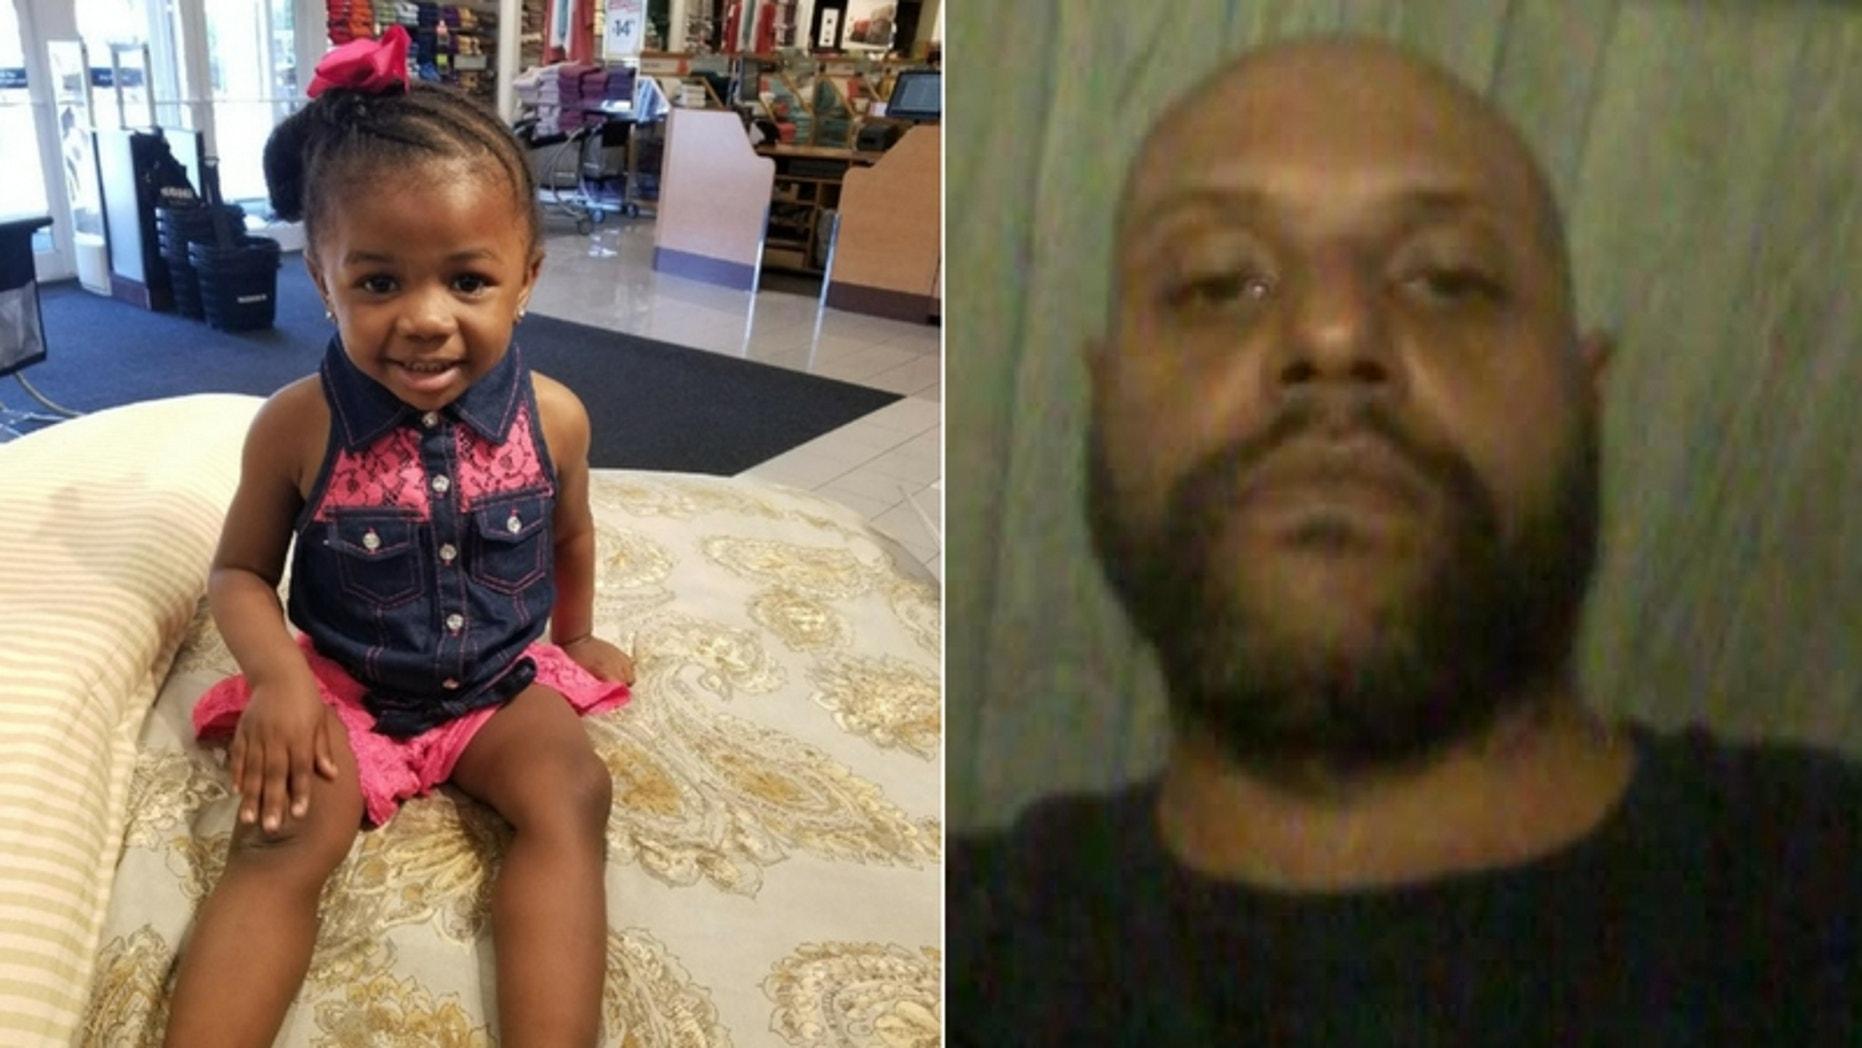 Sandra Renee, 2, and Grady Barrett, 42. (Detroit Police Department)